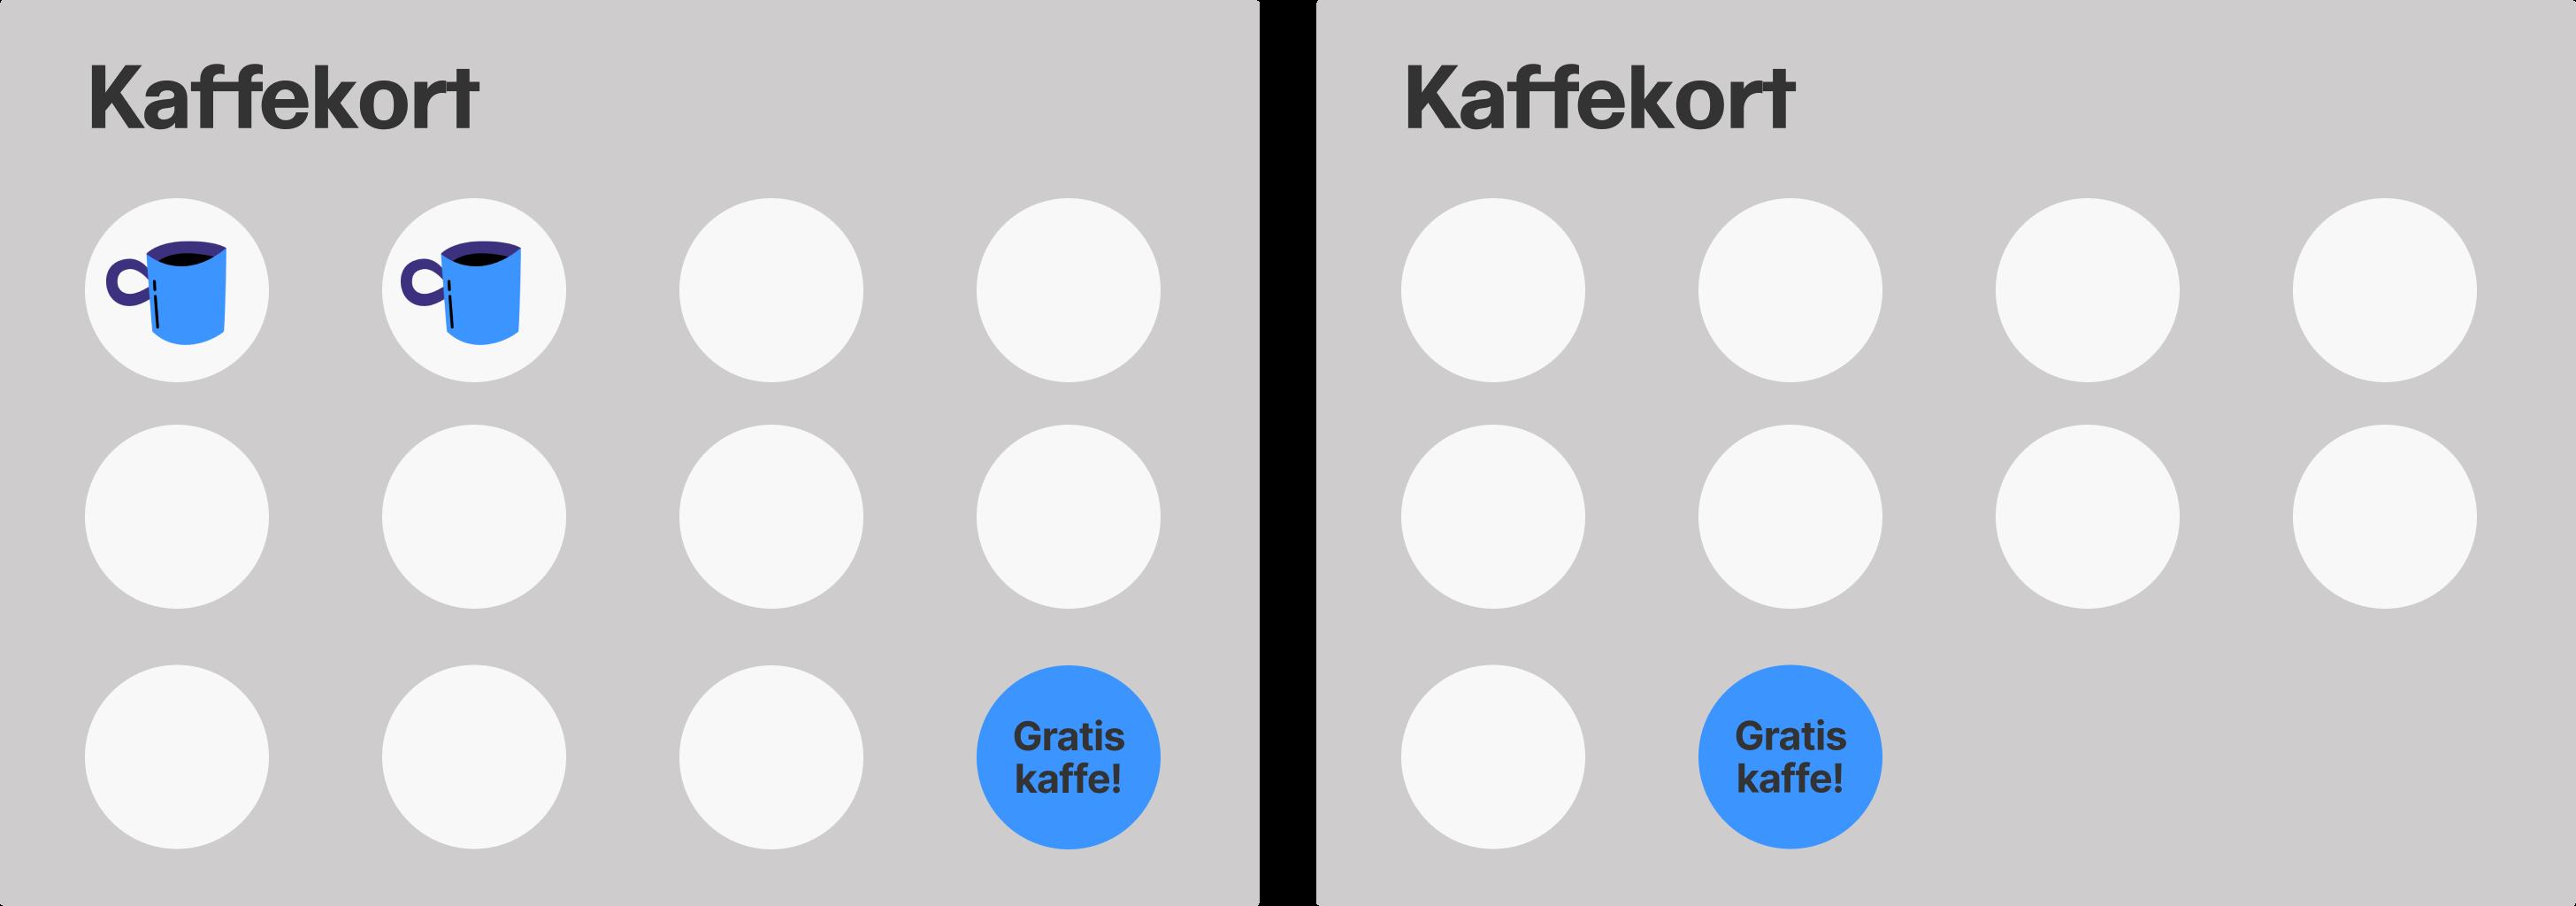 Bilde som viser et kaffekort hvor målet er gratis kaffe